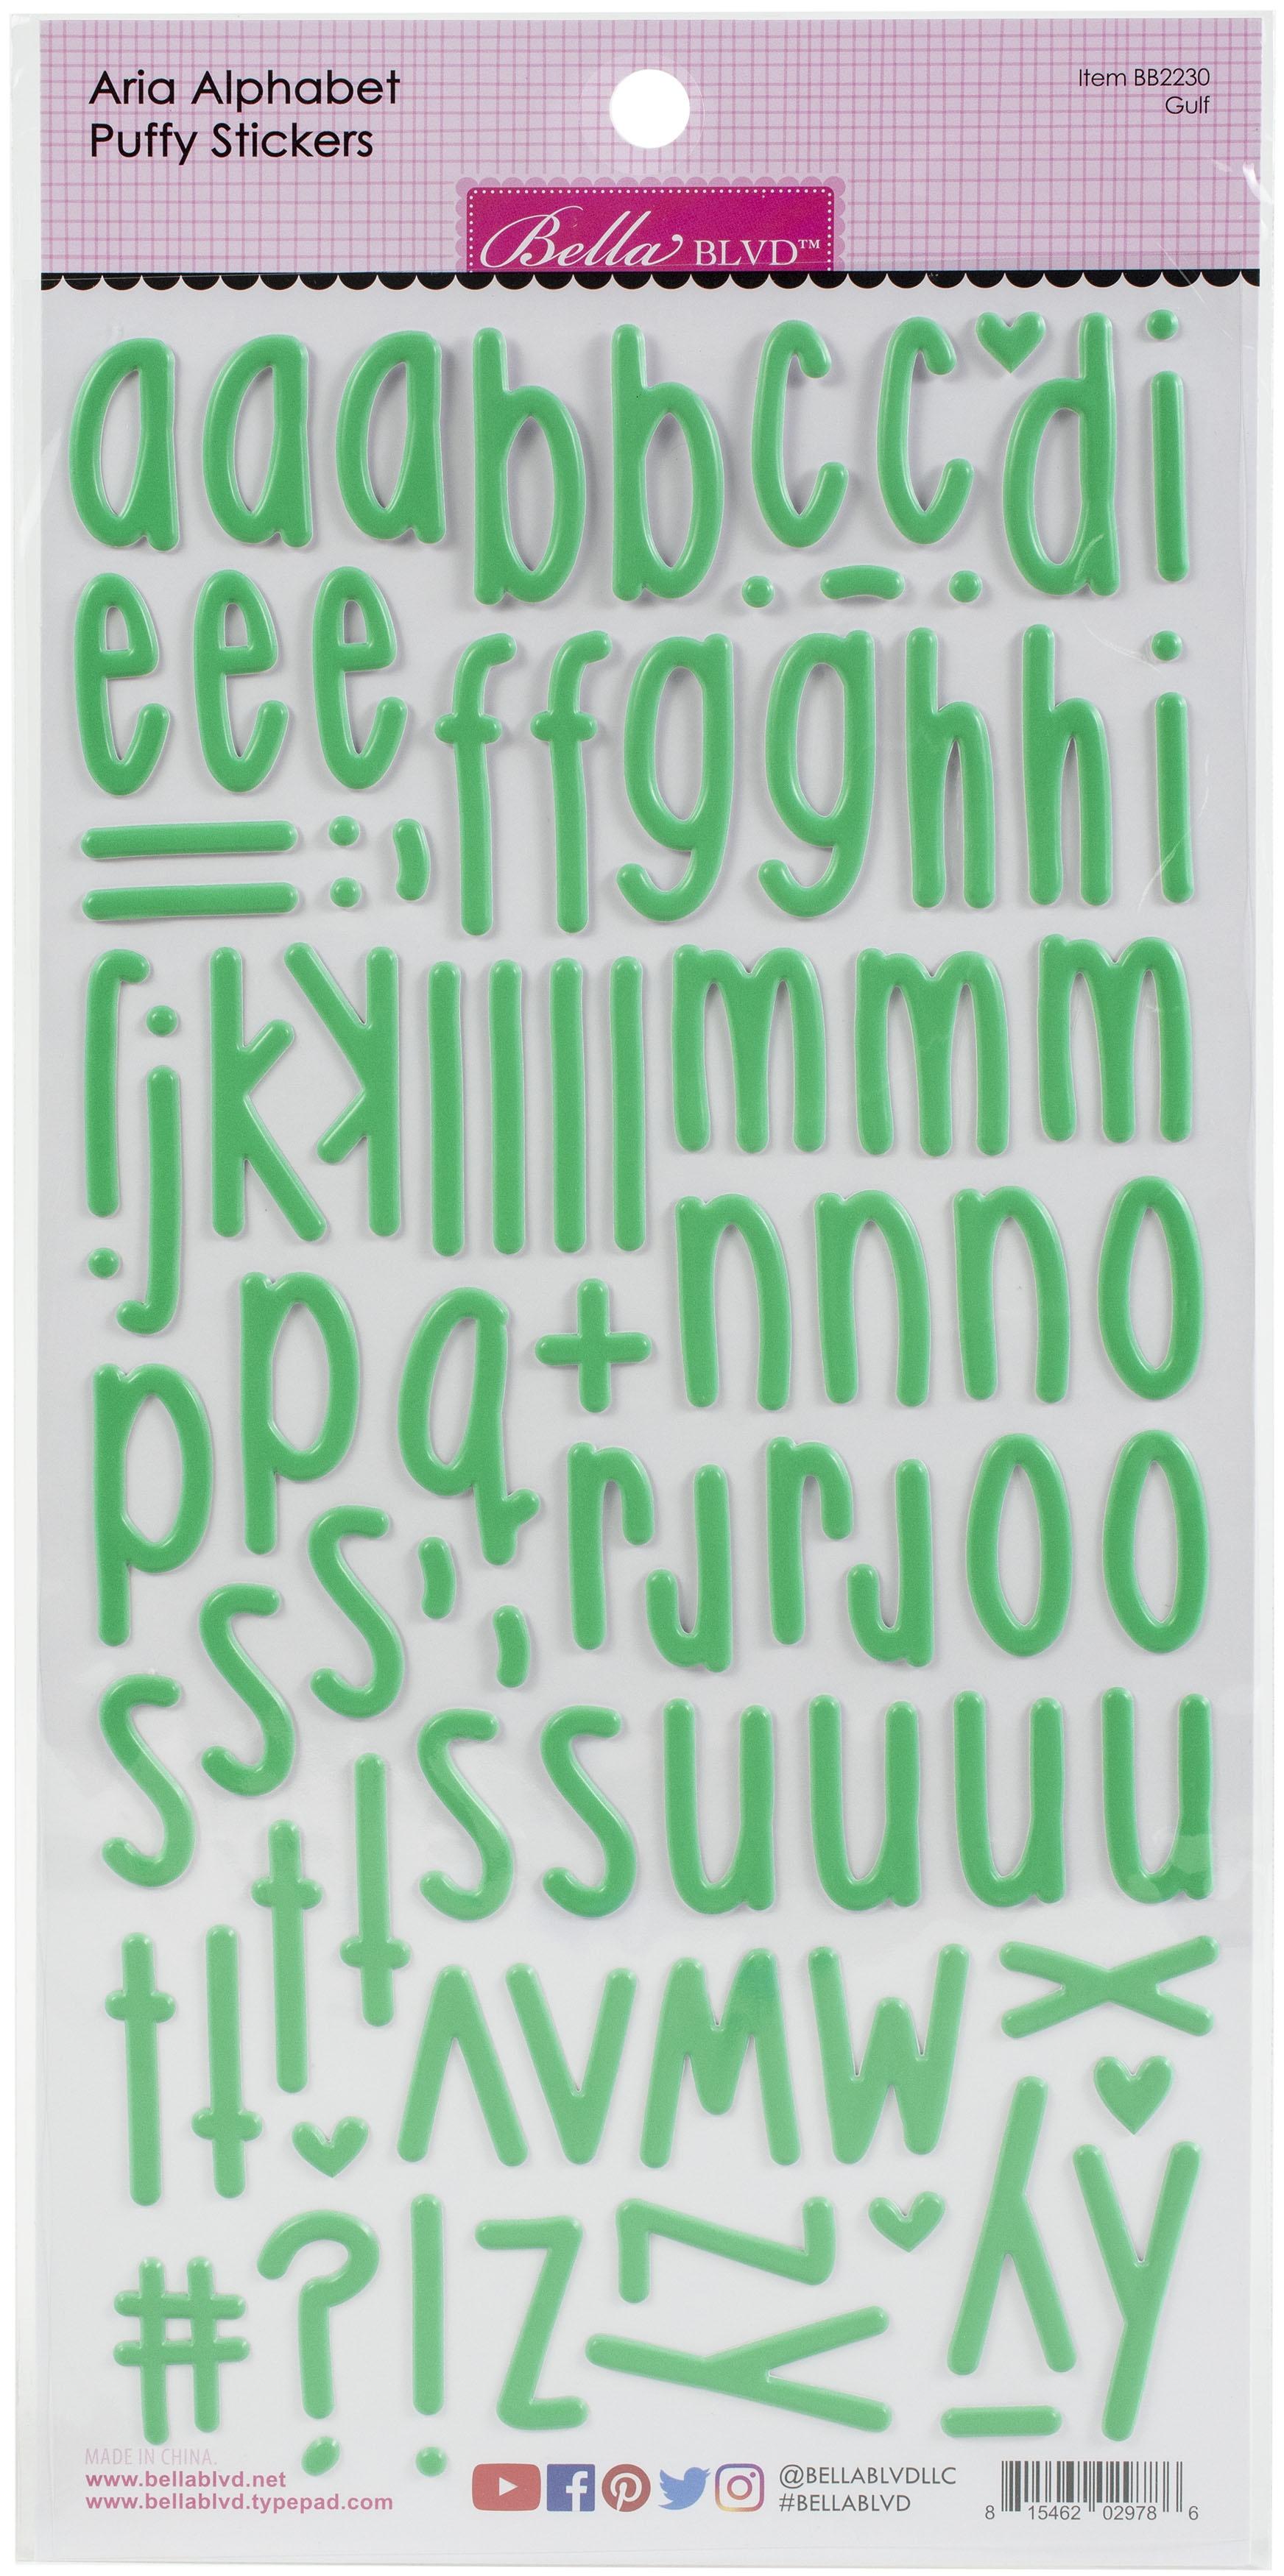 Aria Alpha Puffy Stickers-Gulf